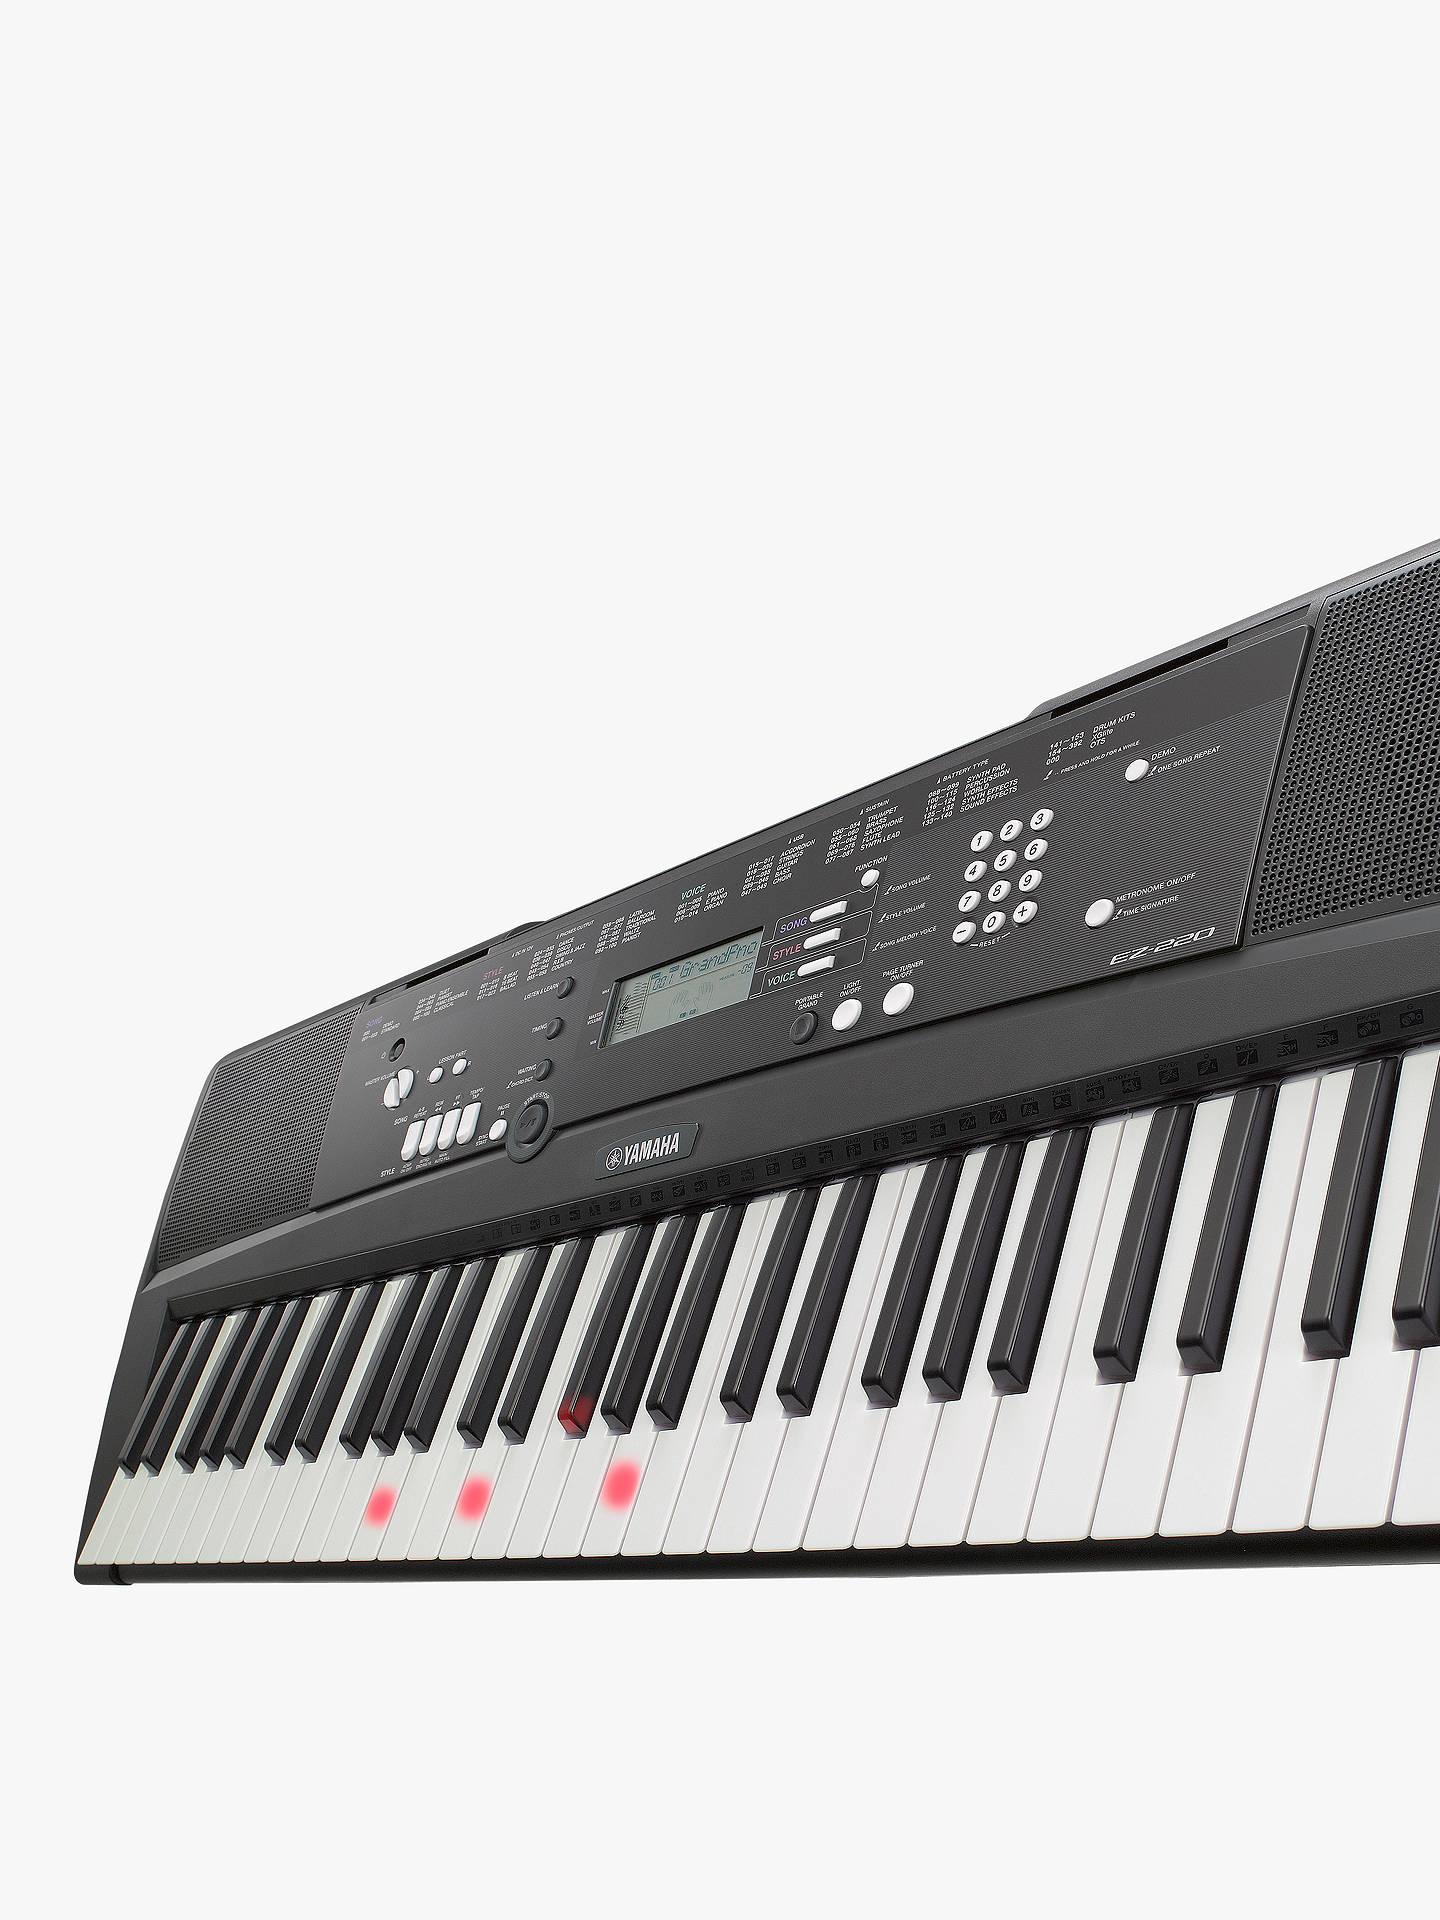 yamaha ez 220 portable electronic keyboard at john lewis partners. Black Bedroom Furniture Sets. Home Design Ideas